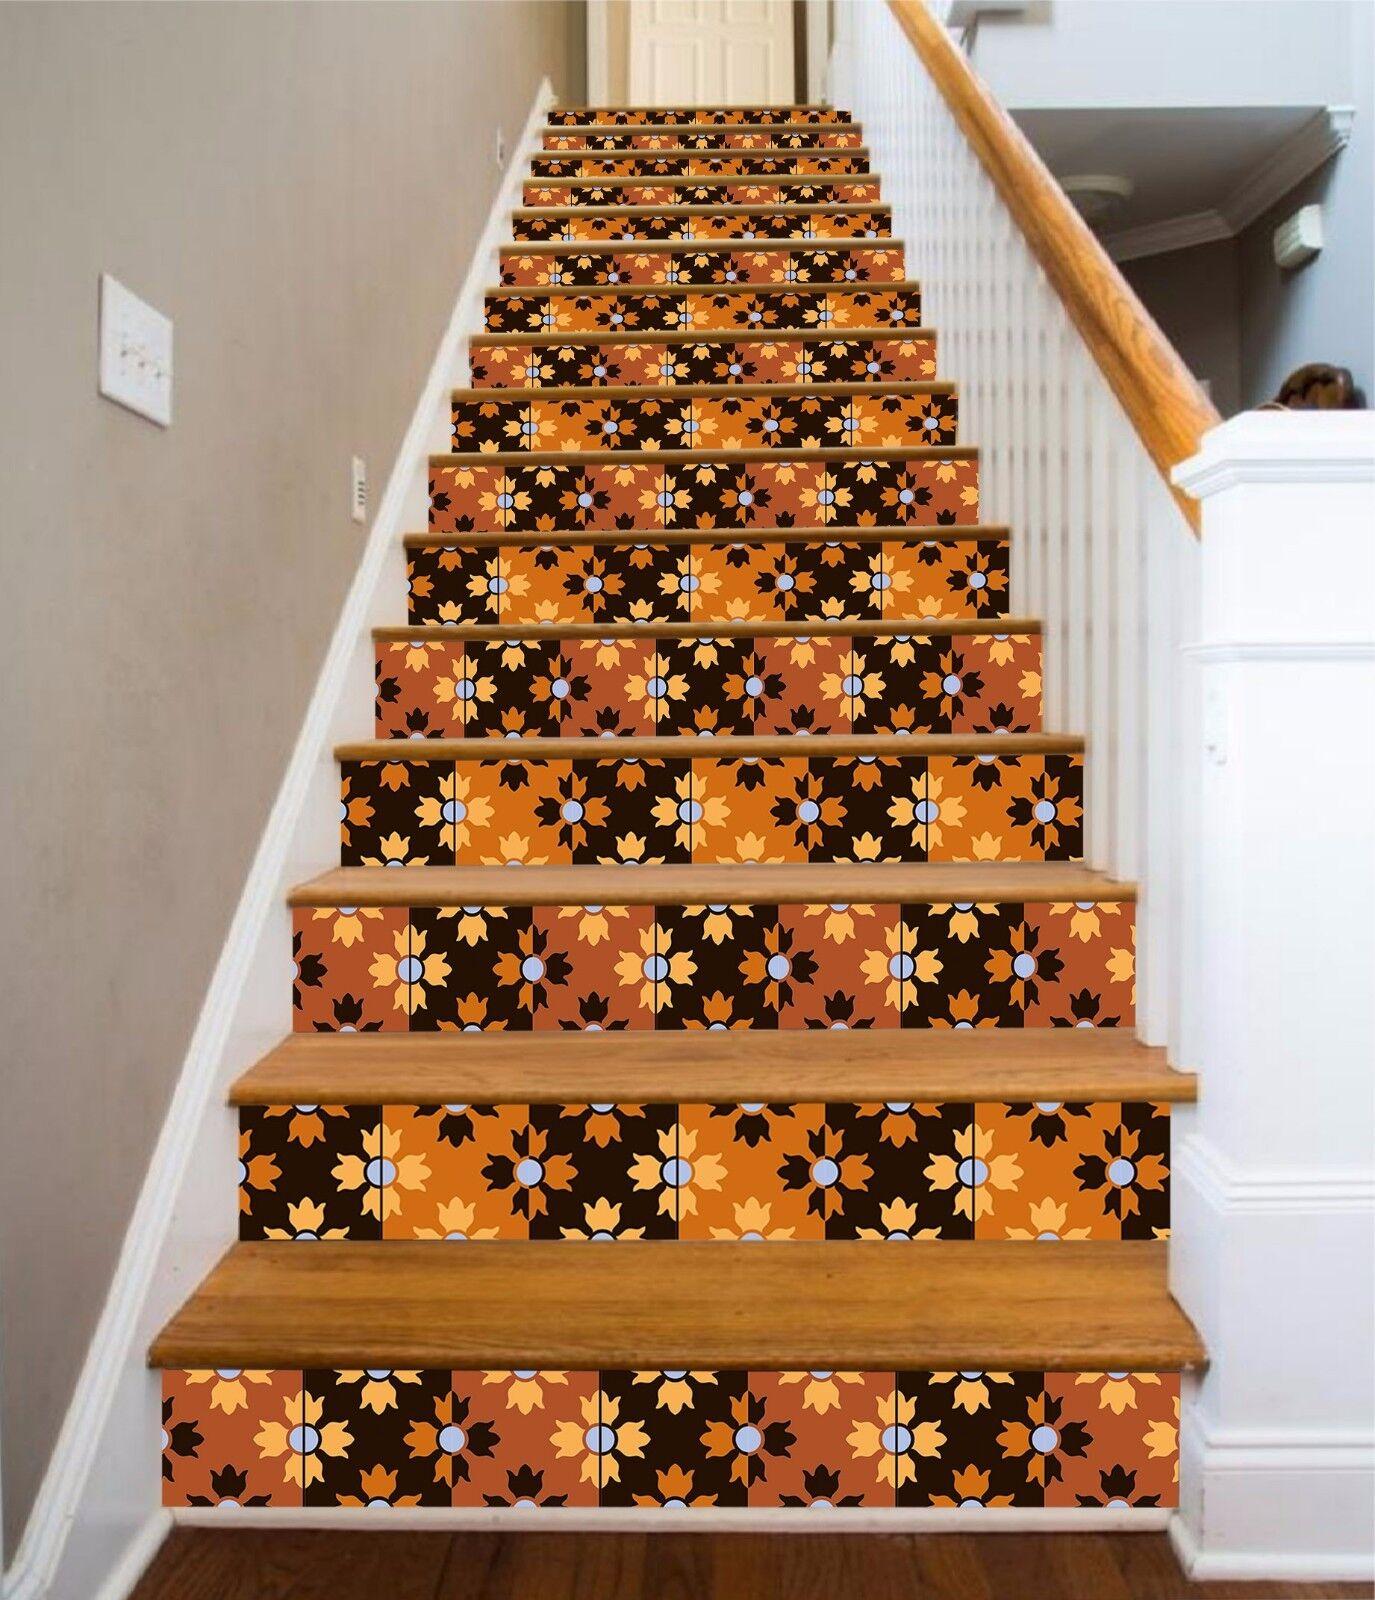 3D Blumenmuster 378 Stair Risers Dekoration Dekoration Dekoration Fototapete Vinyl Aufkleber Tapete DE 620f29